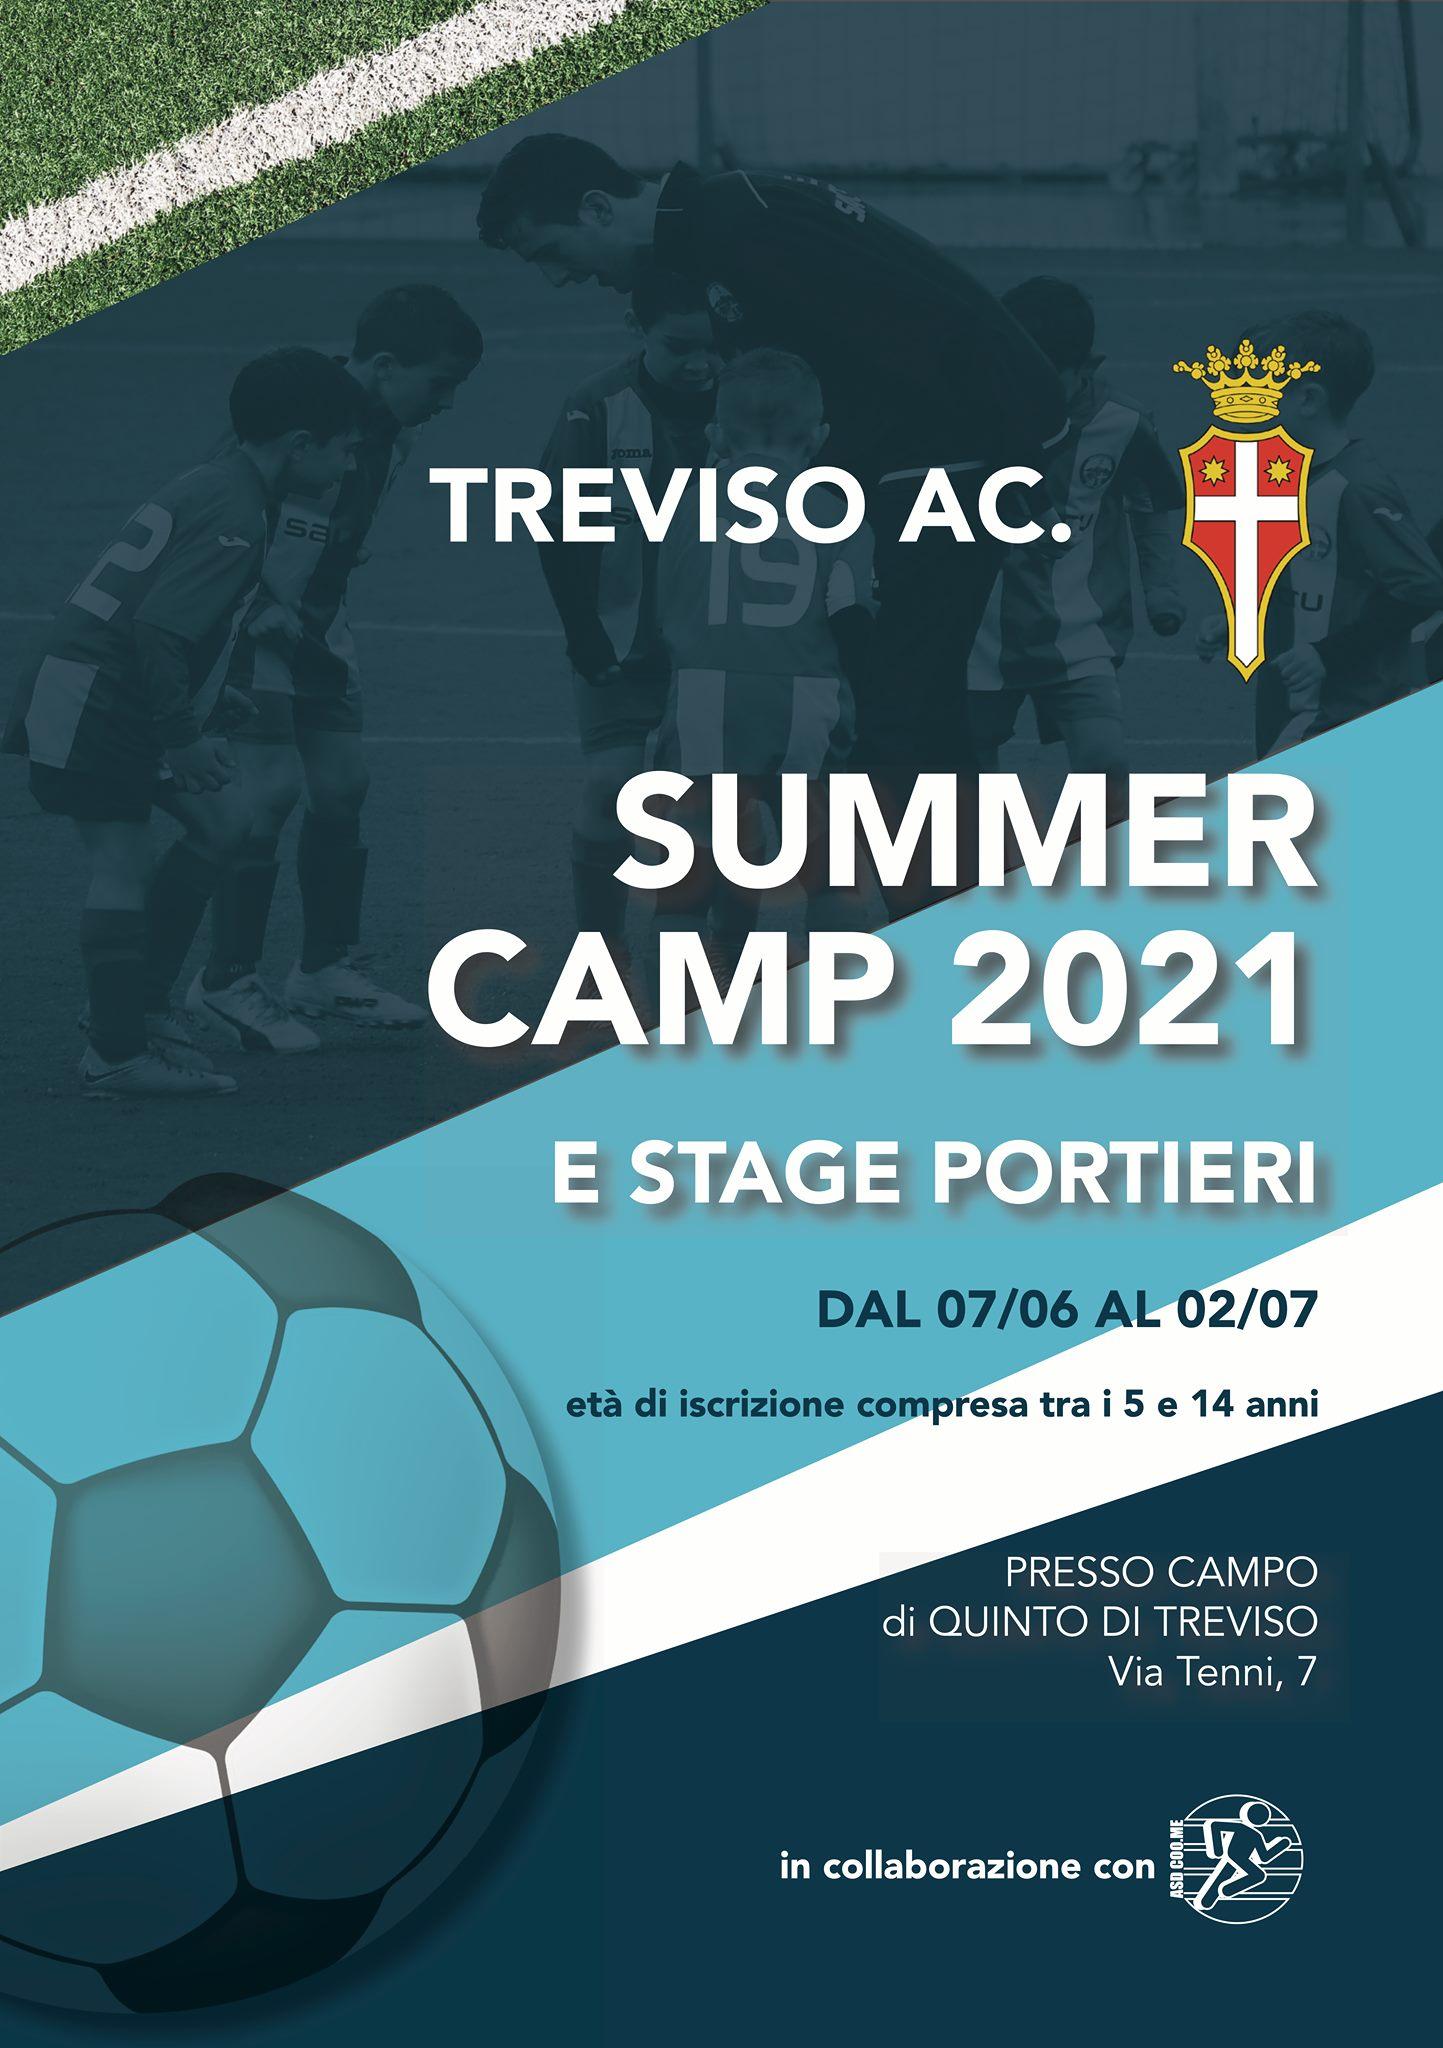 Treviso campo 2021 1